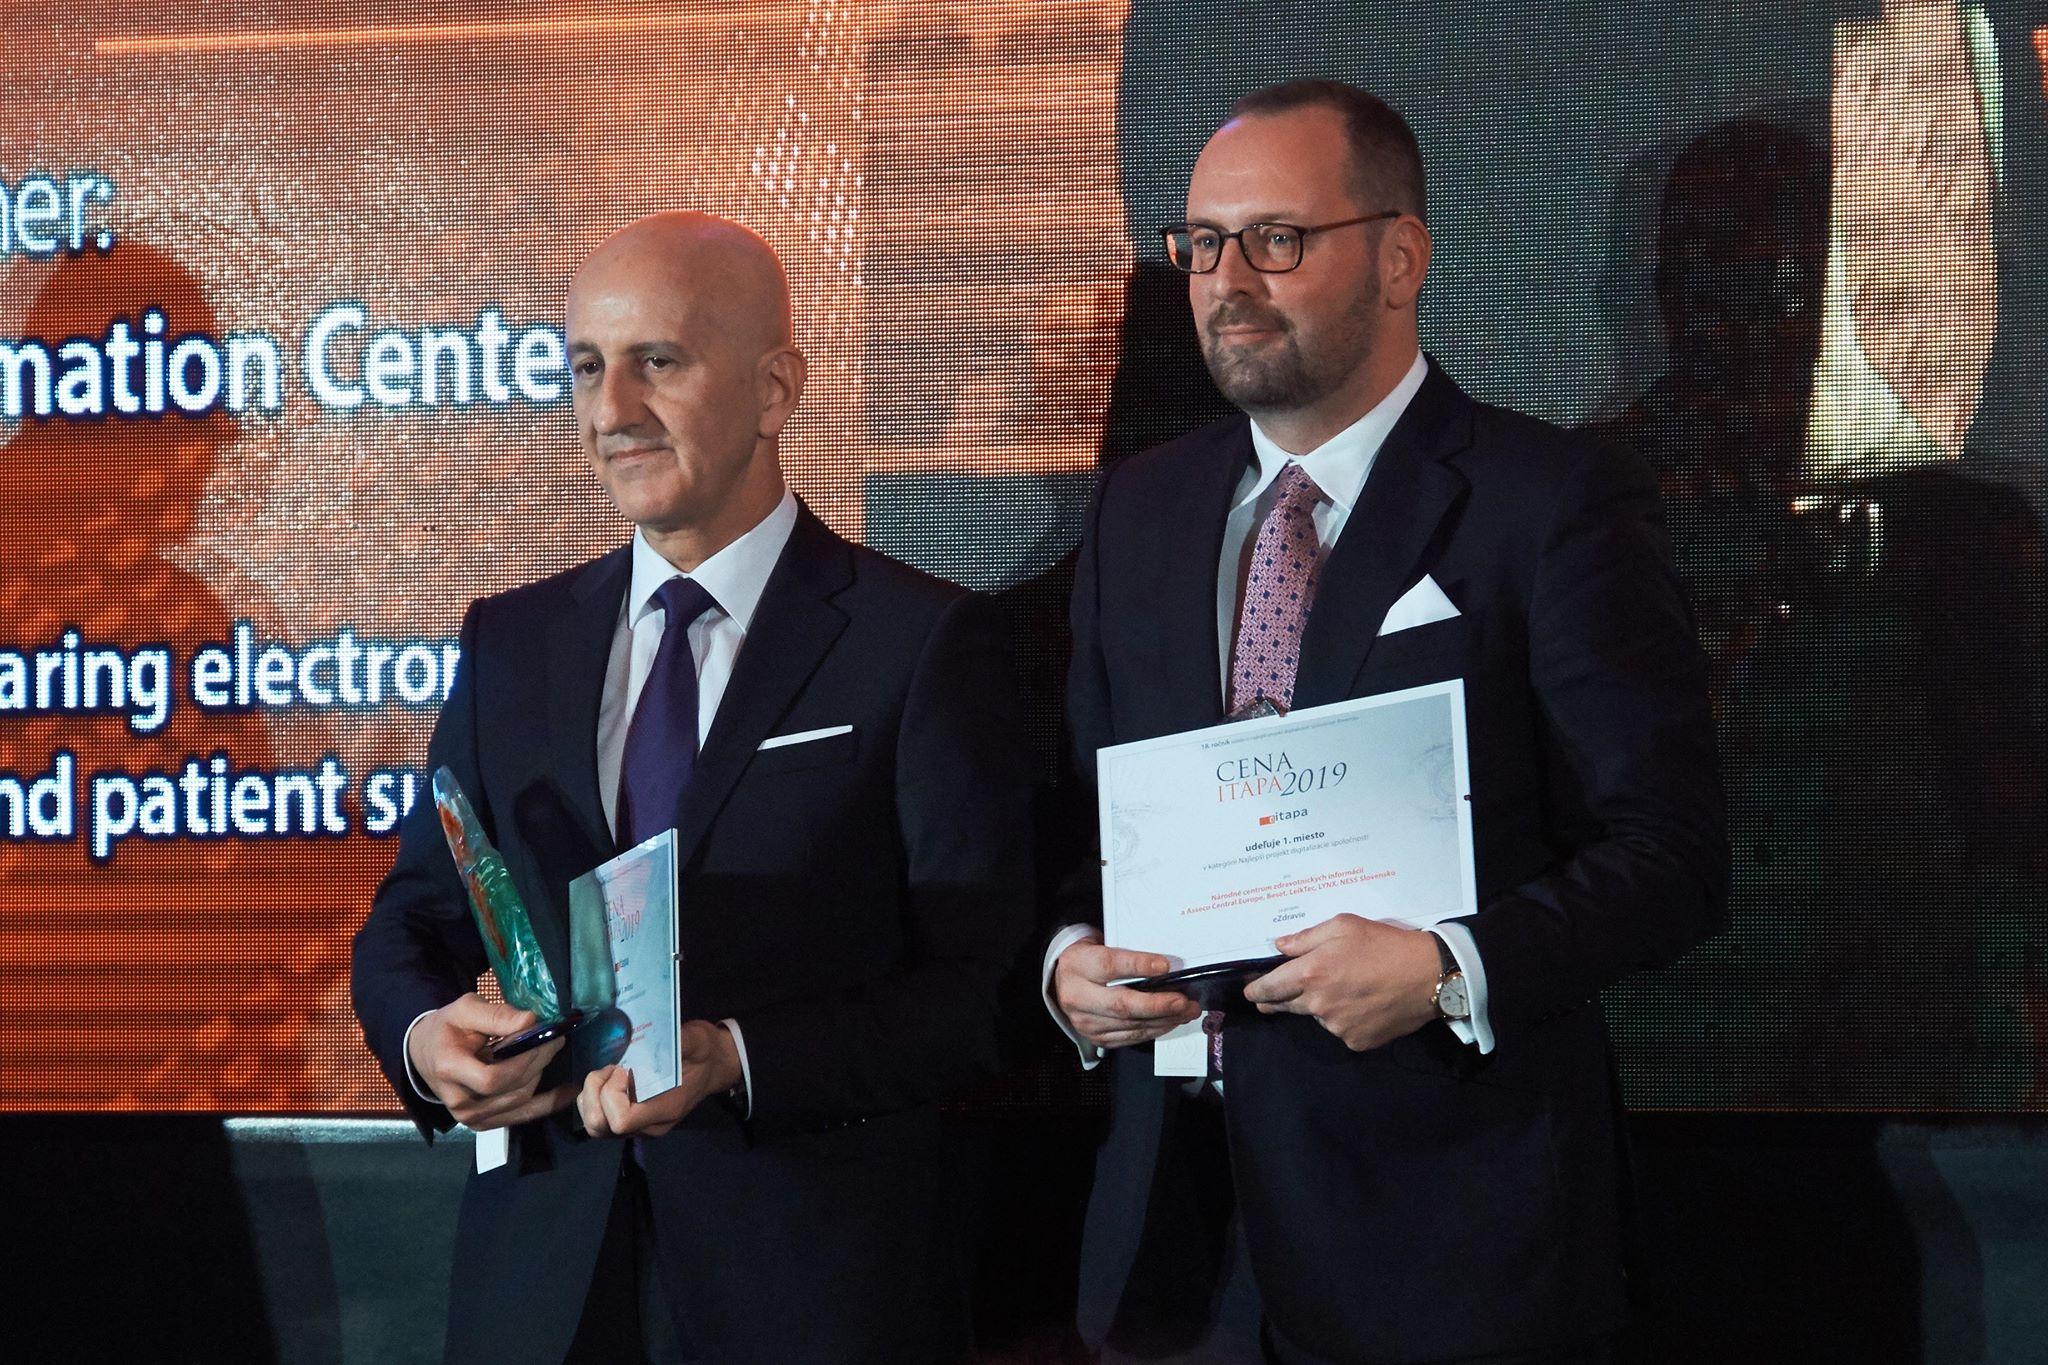 Generálny riaditeľ NCZI s cenou ITAPA 2019.